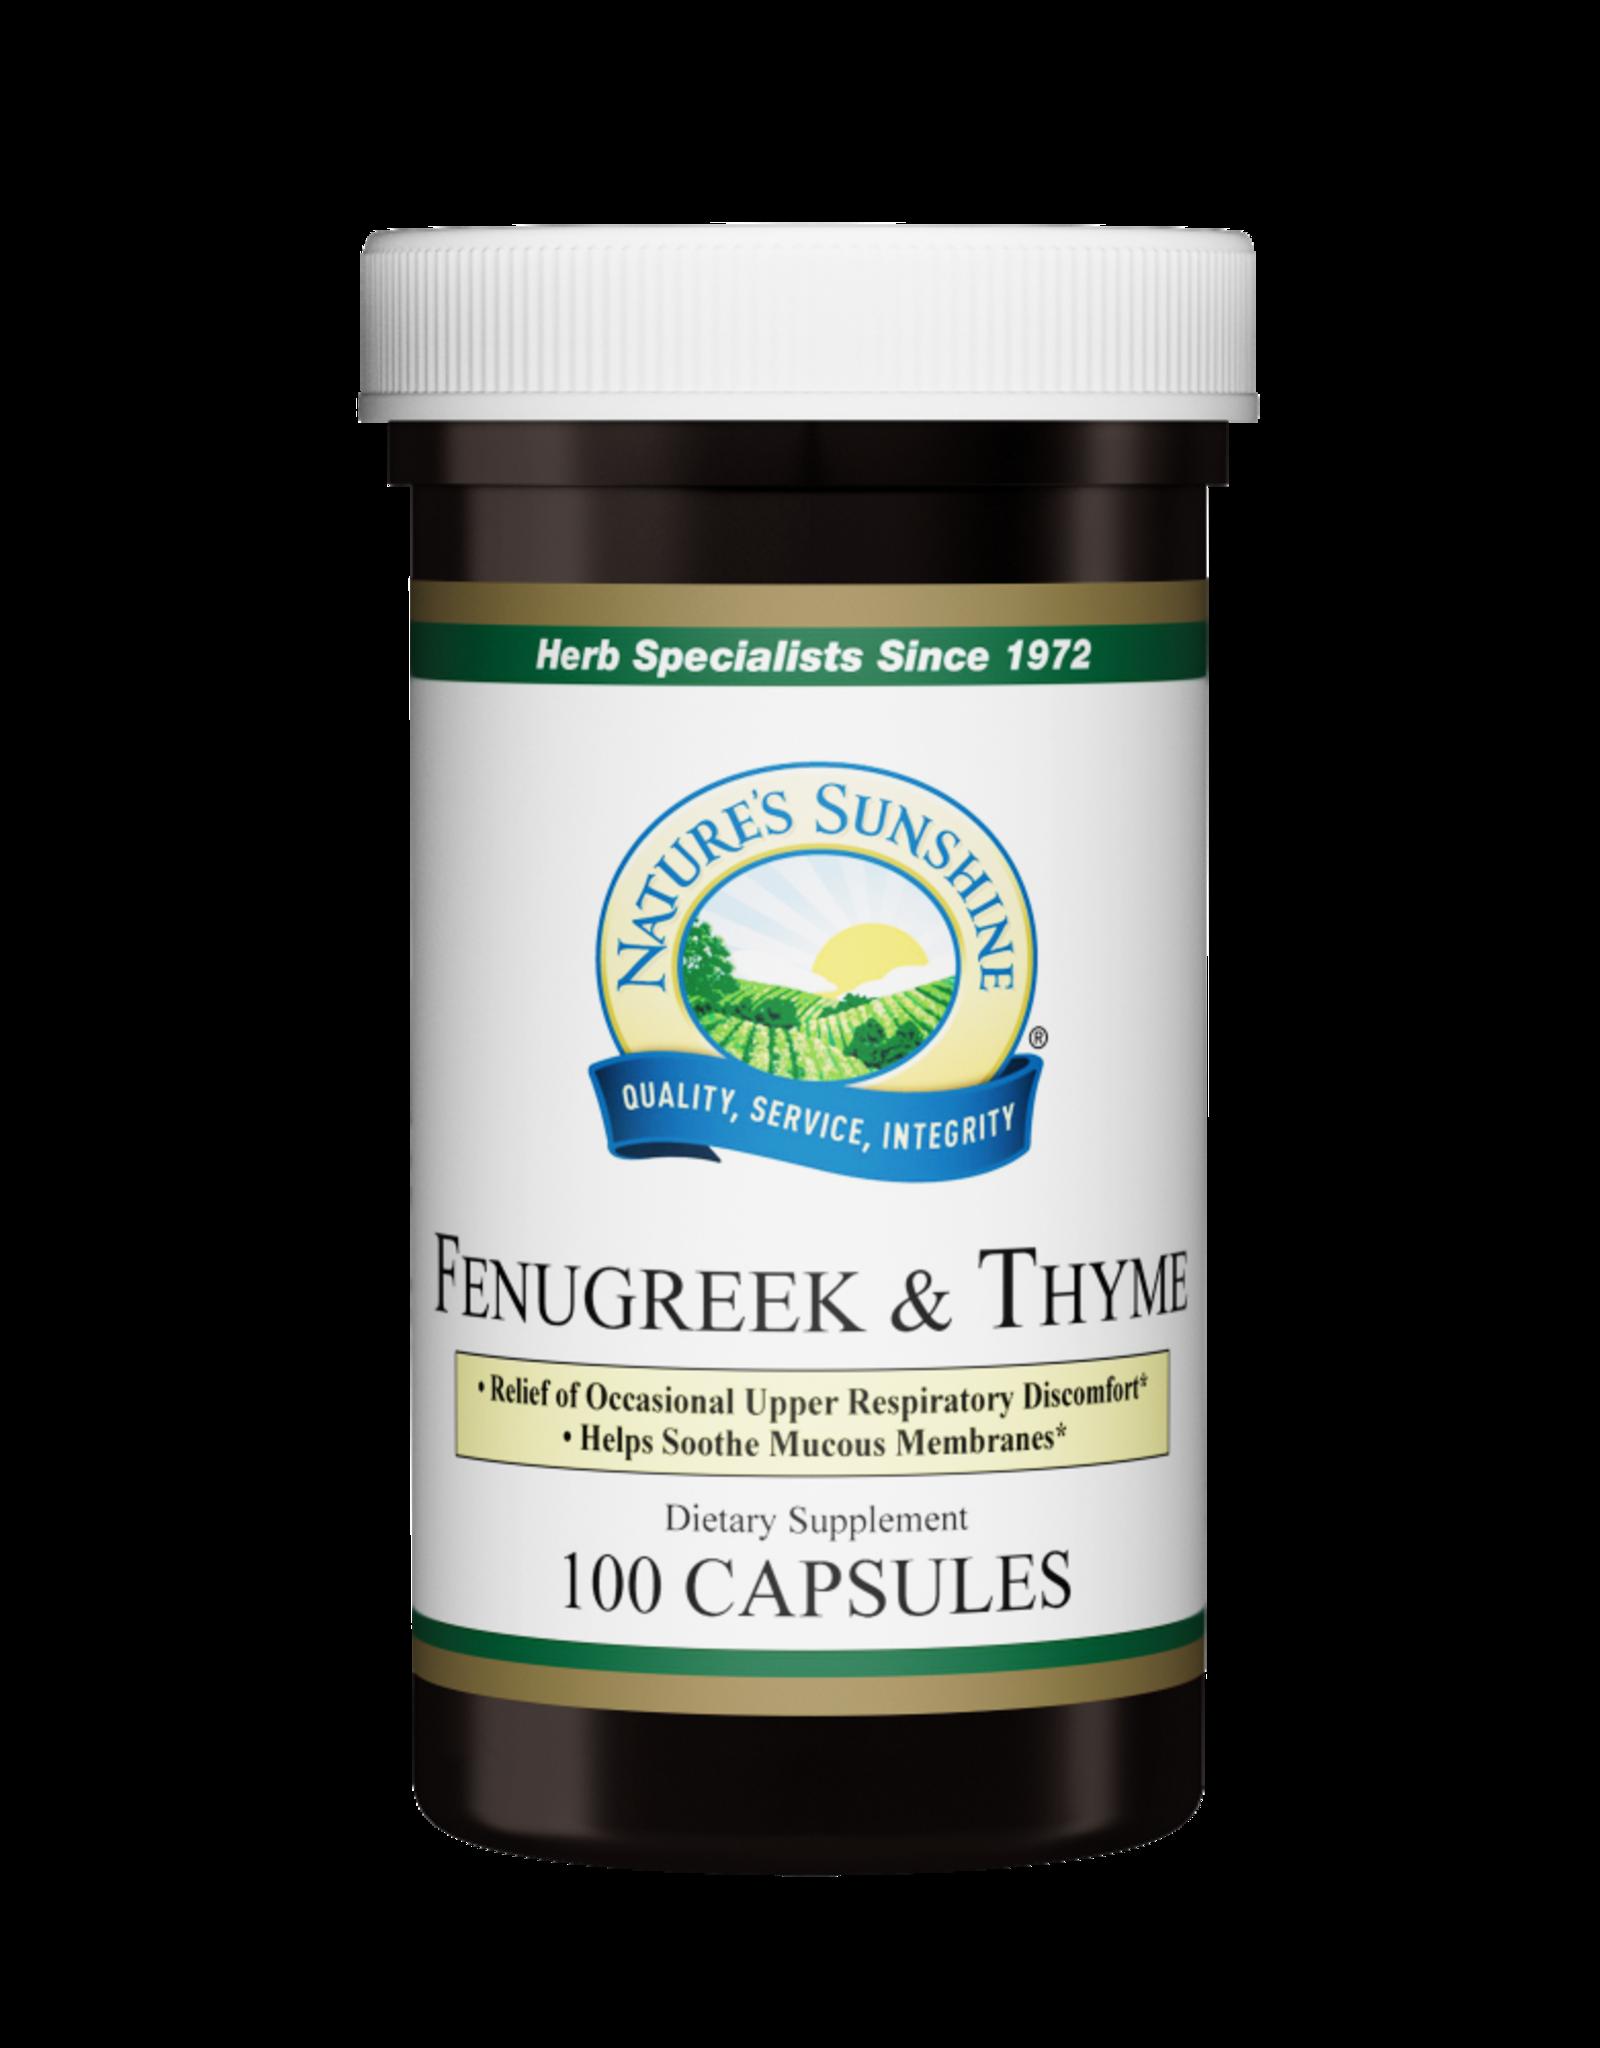 Nature's Sunshine Fenugreek & Thyme (100 caps)*